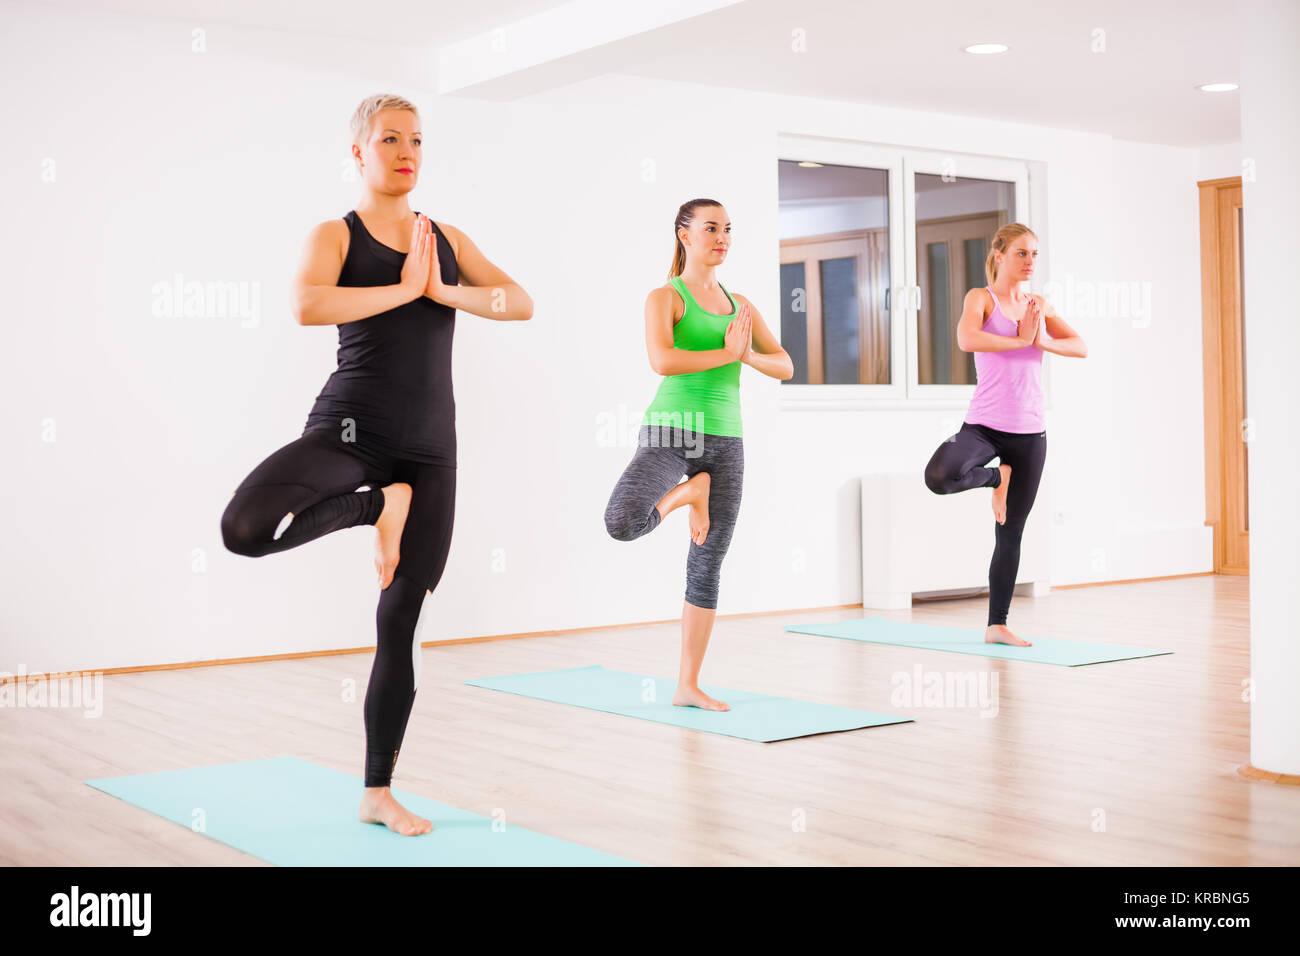 Three girls practicing yoga, Vrikshasana / Tree pose - Stock Image